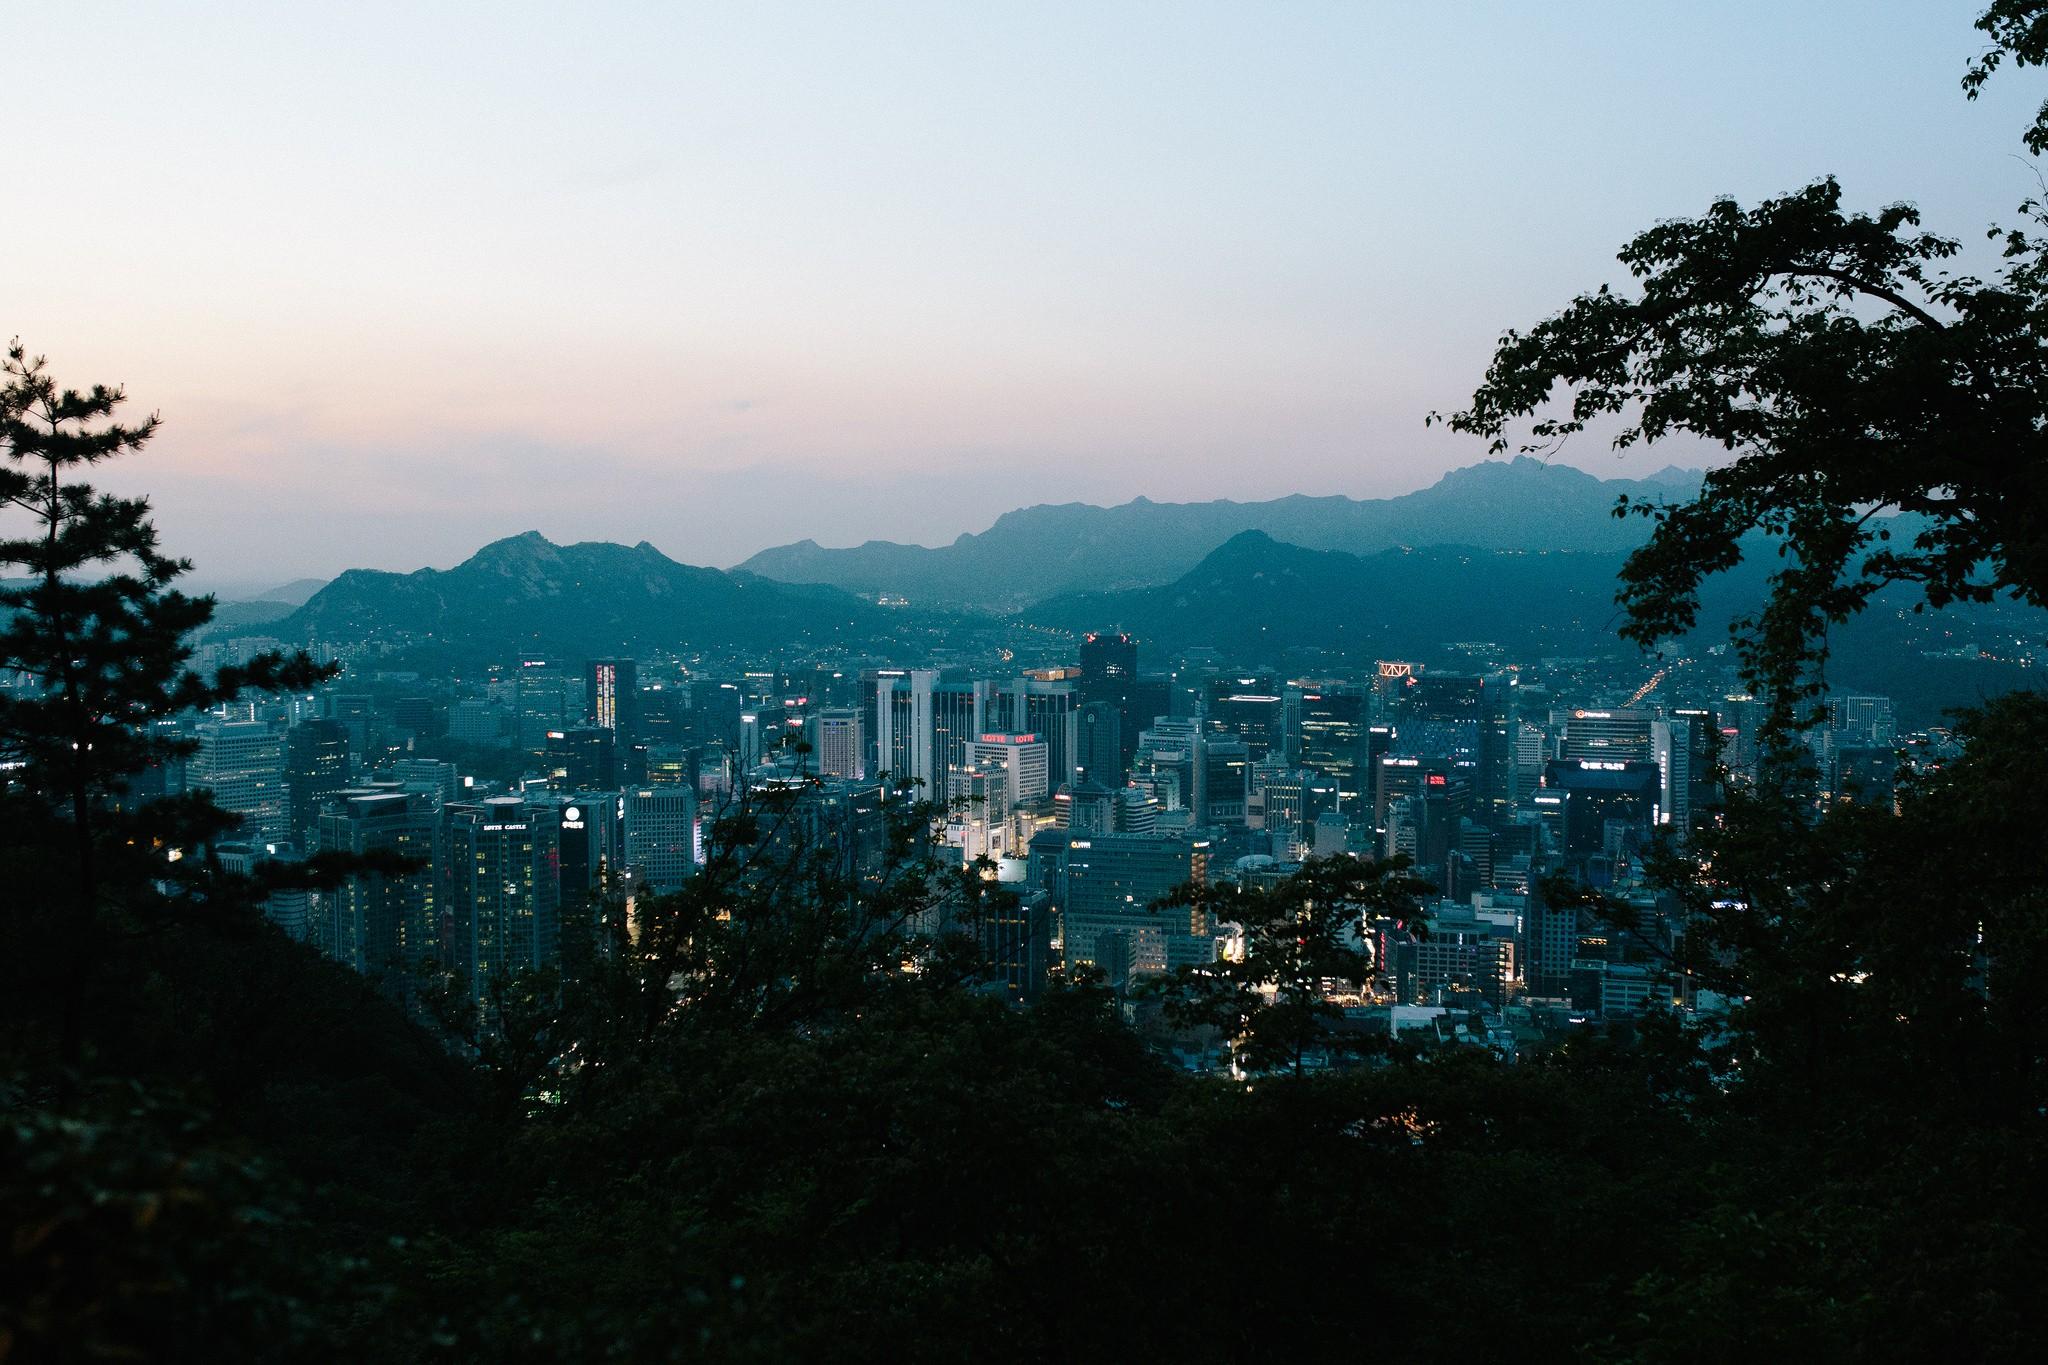 General 2048x1365 dusk city cityscape Seoul mountains